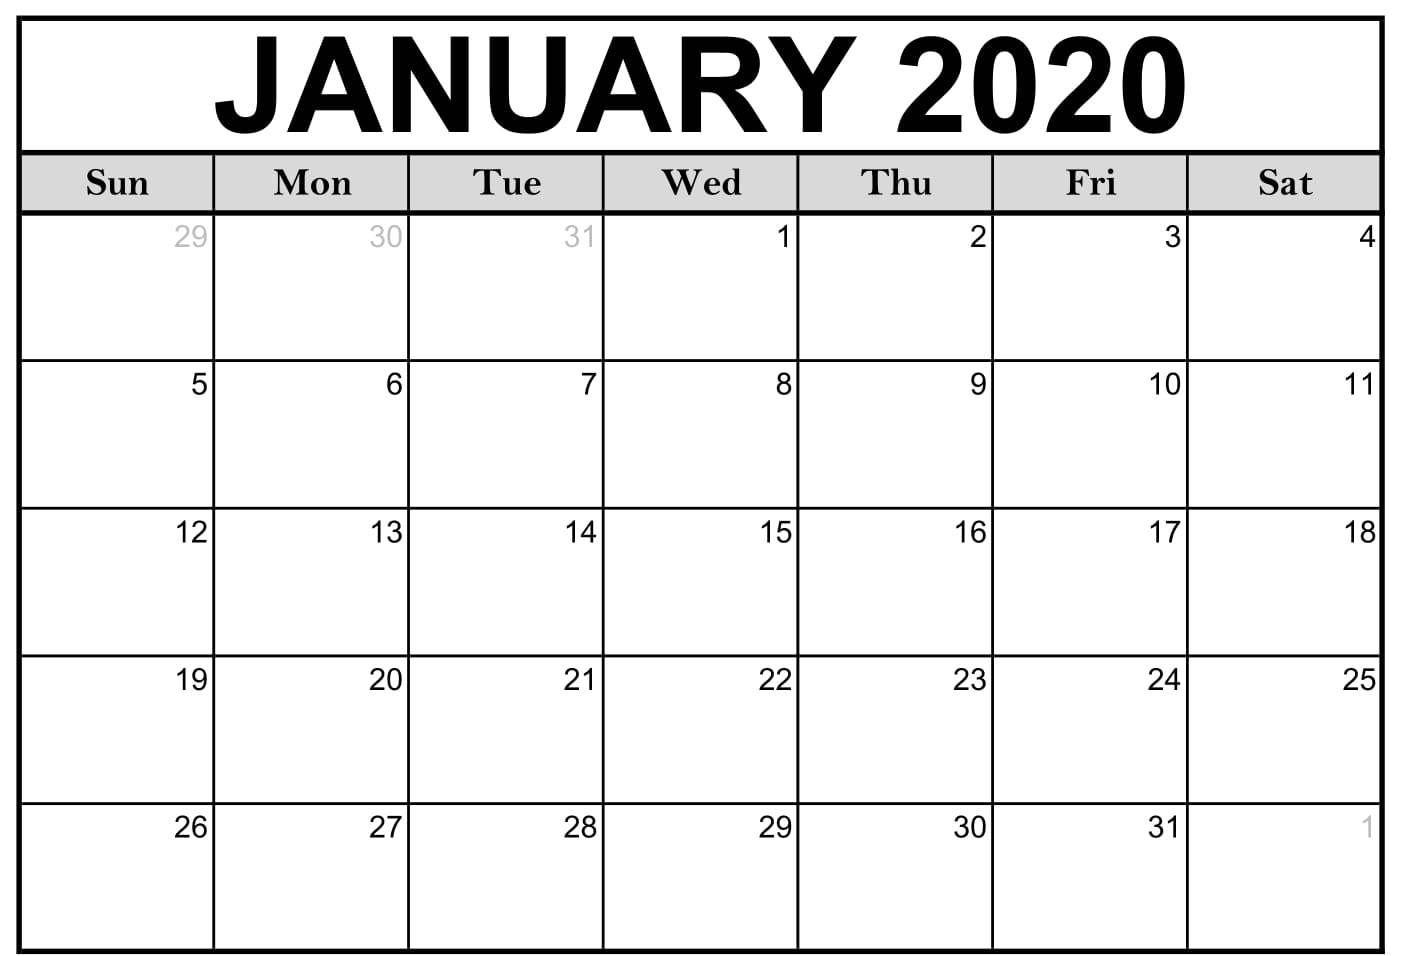 January 2020 Calendar Template | Free Printable Calendar